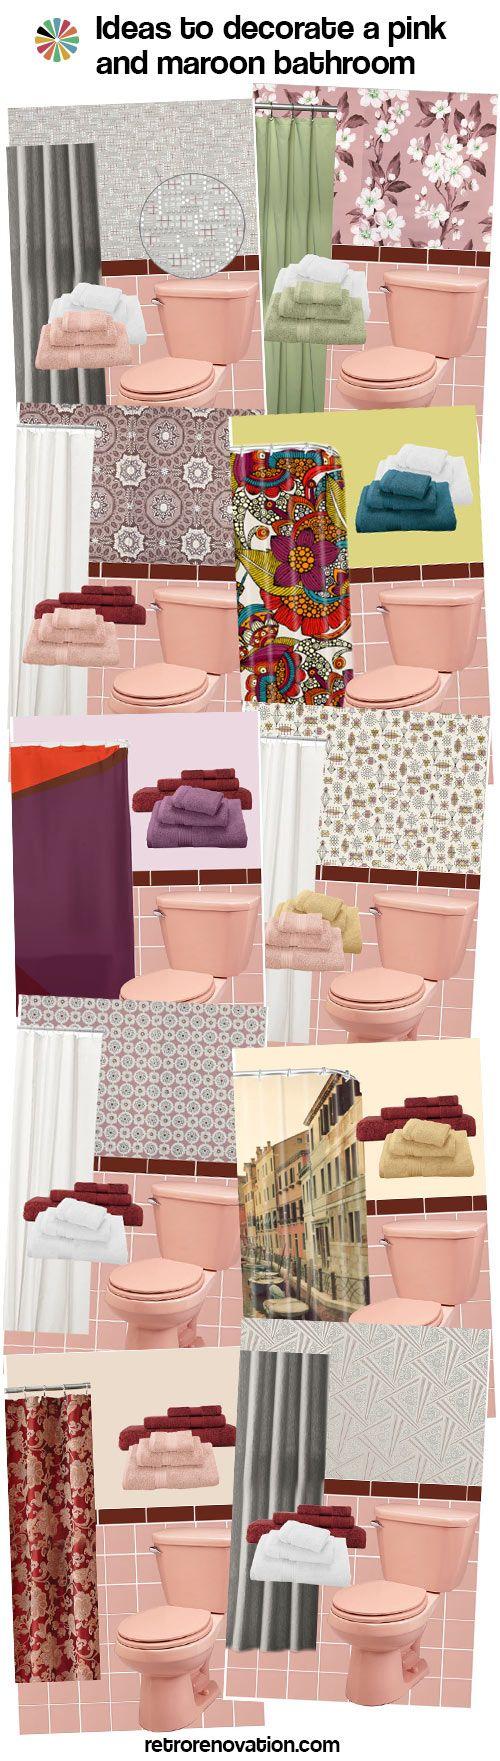 retro pink and maroon bathroom design ideas #midcentury